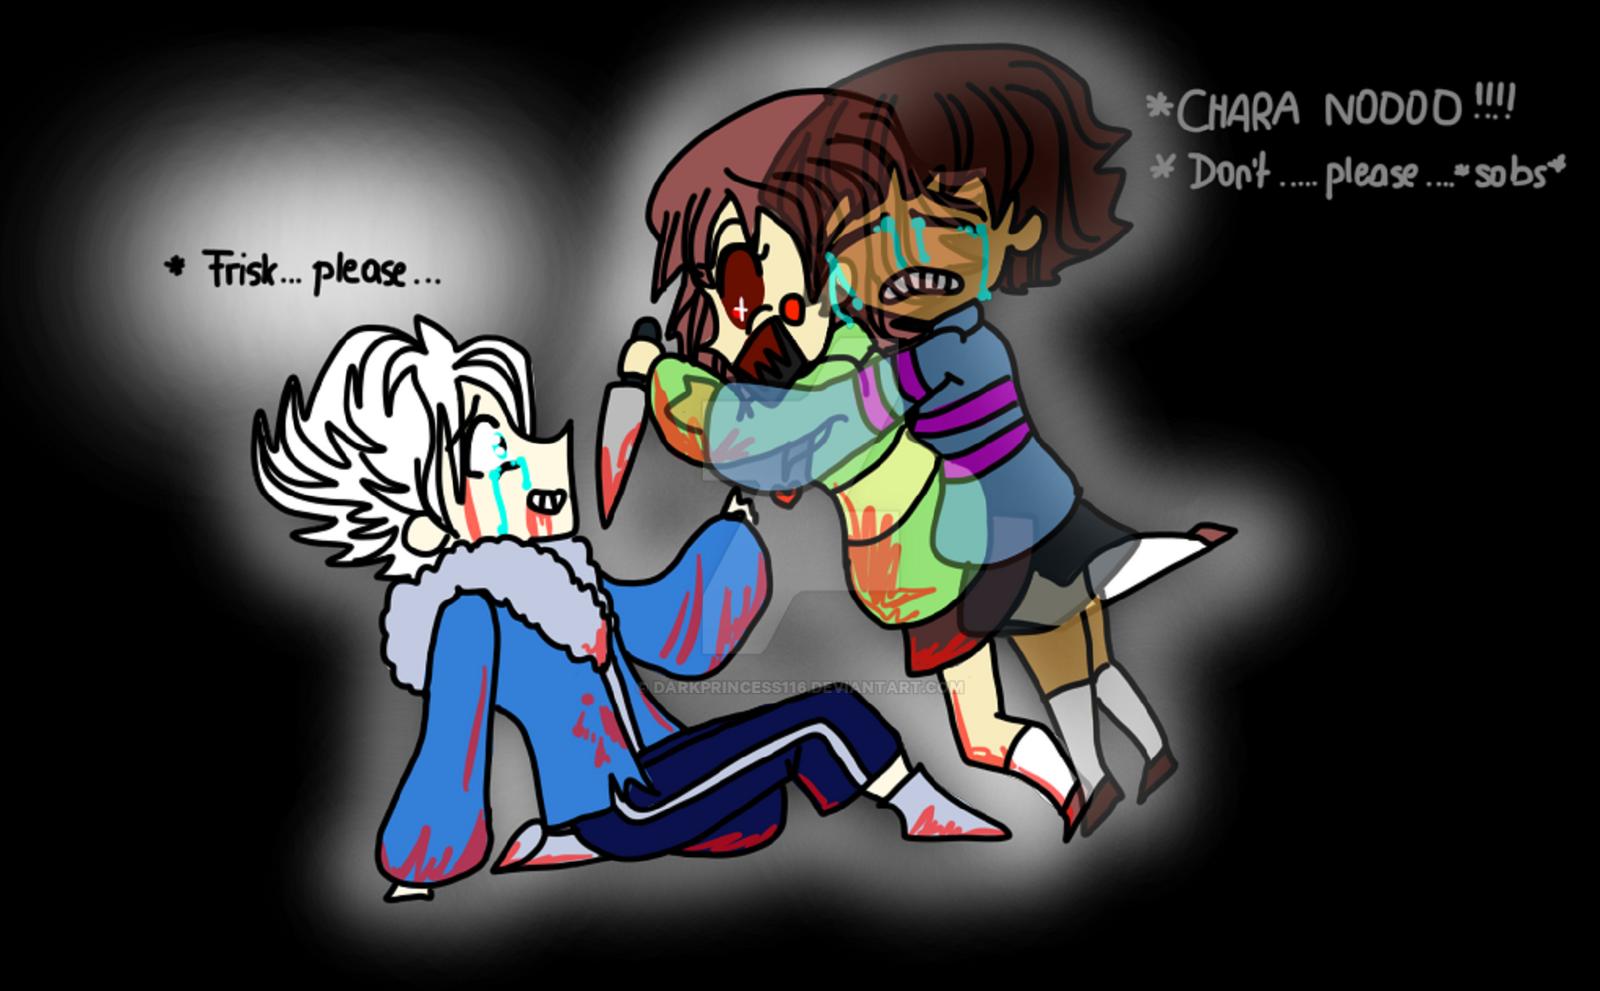 UNDERTALE: Chara just STOP ALREADY by DarkPrincess116 on